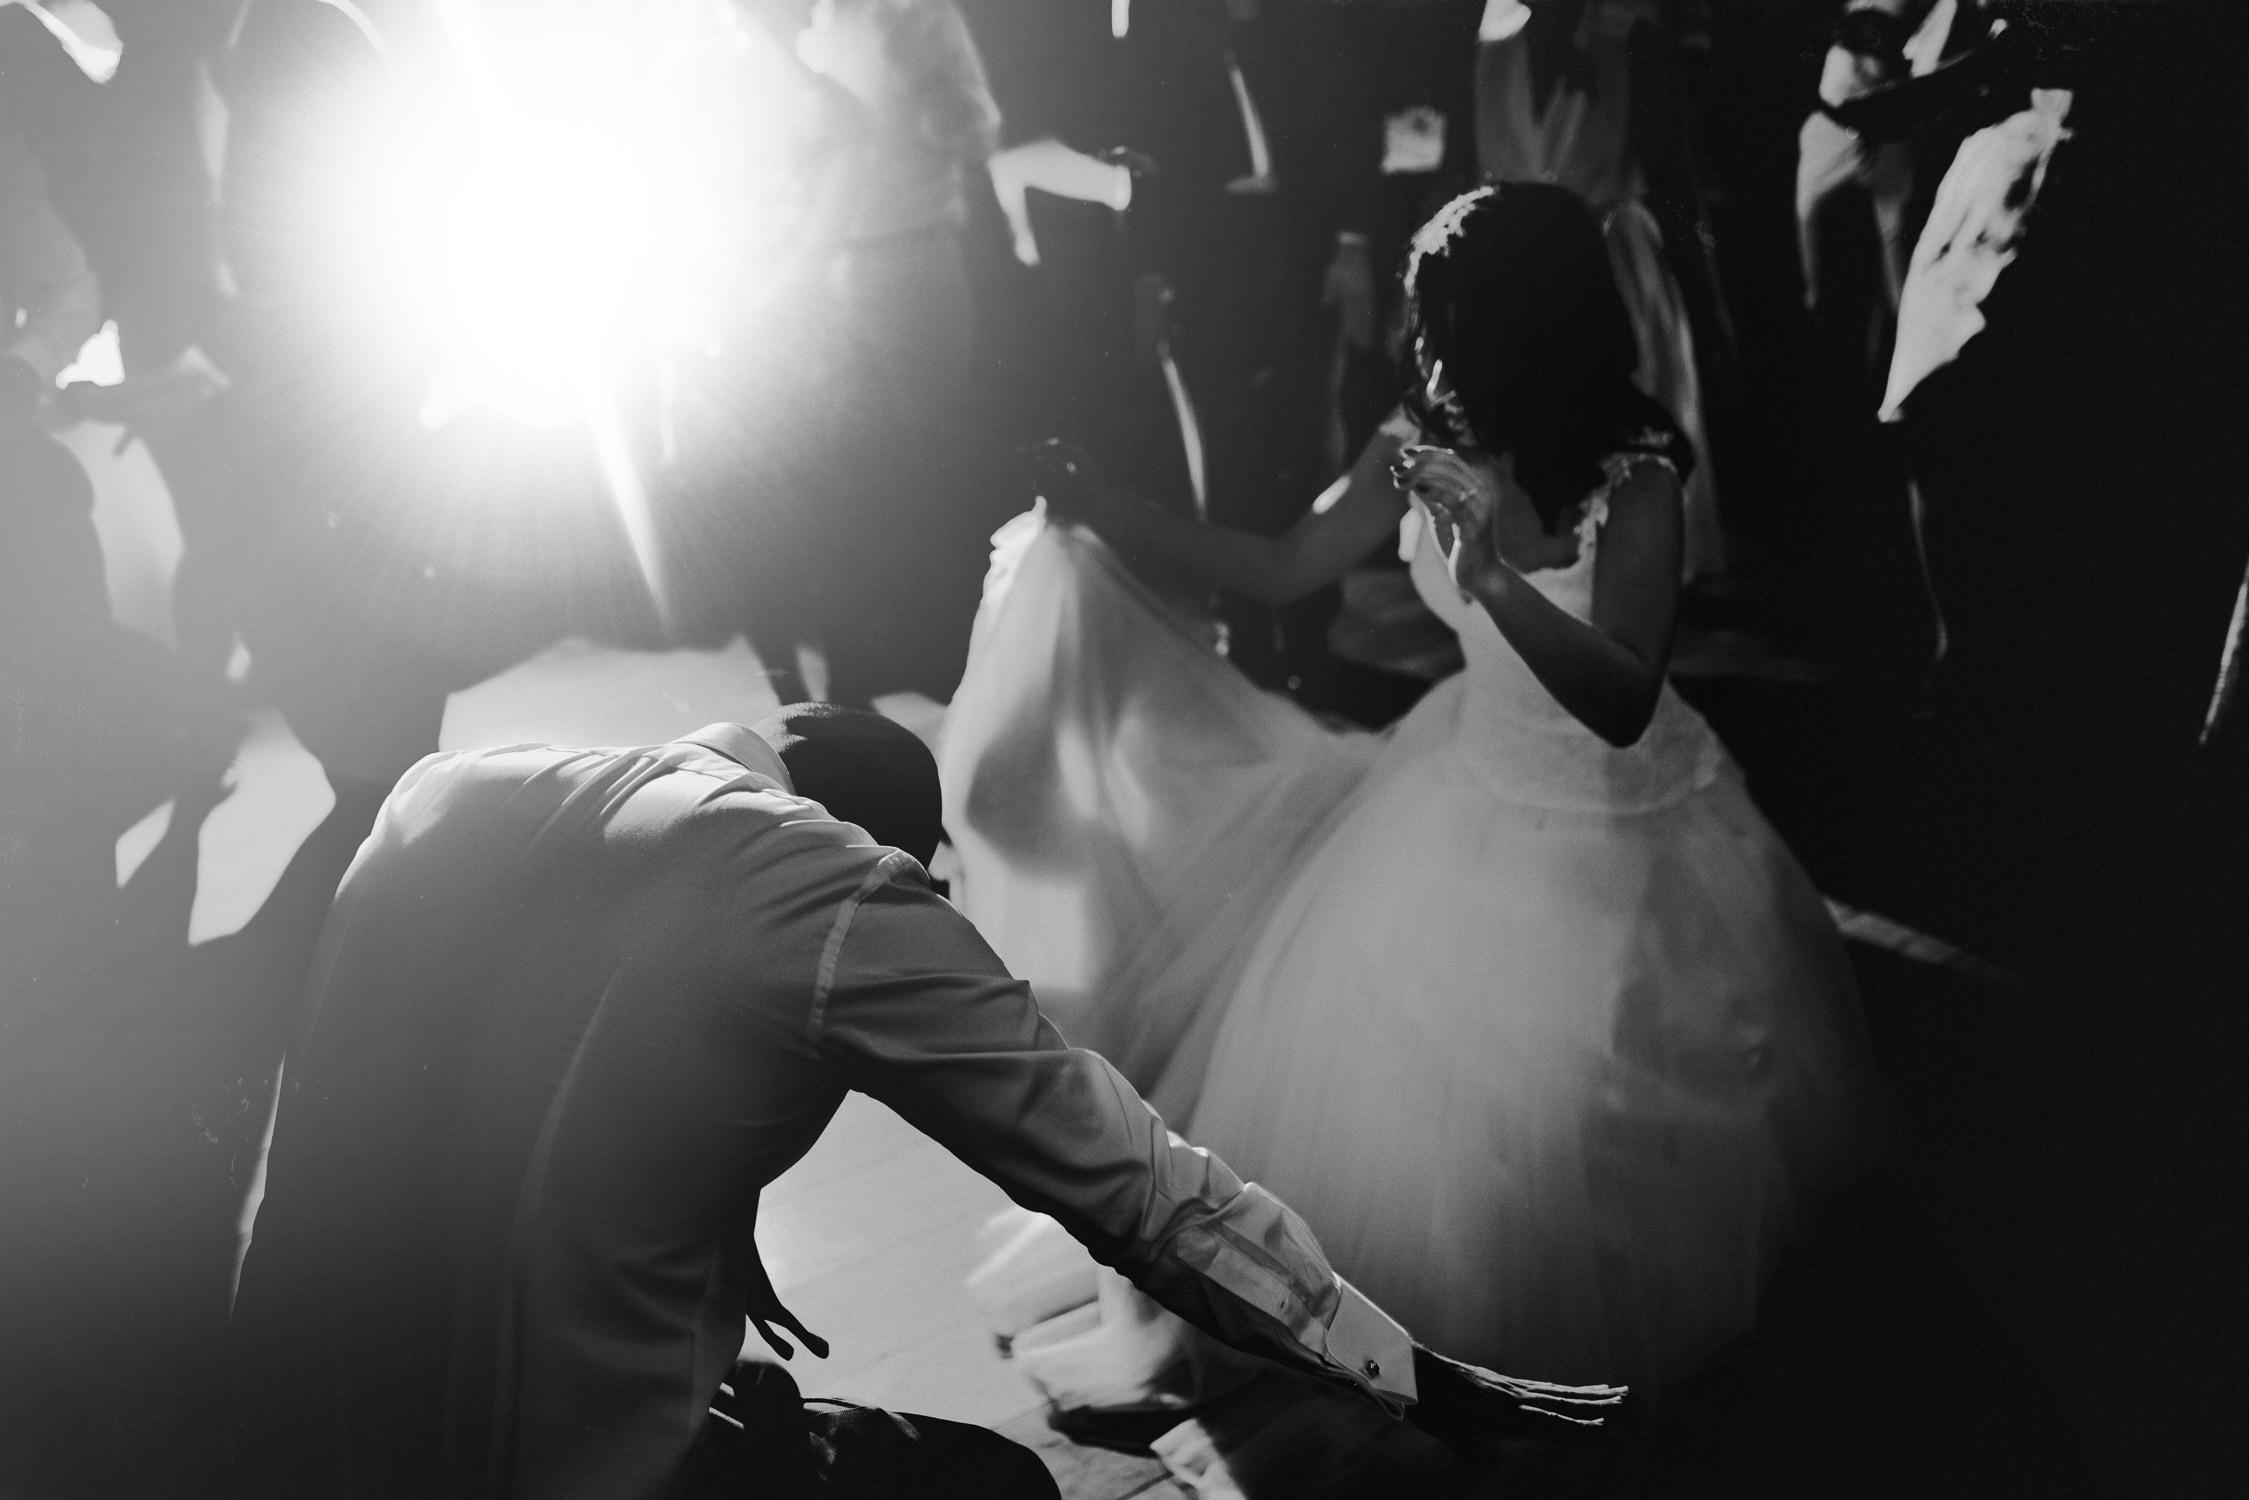 bruidsfotografie-amsterdam-utrecht-trouwfotograaf-mark-hadden-wedding-photography-dado-dalila-478.jpg